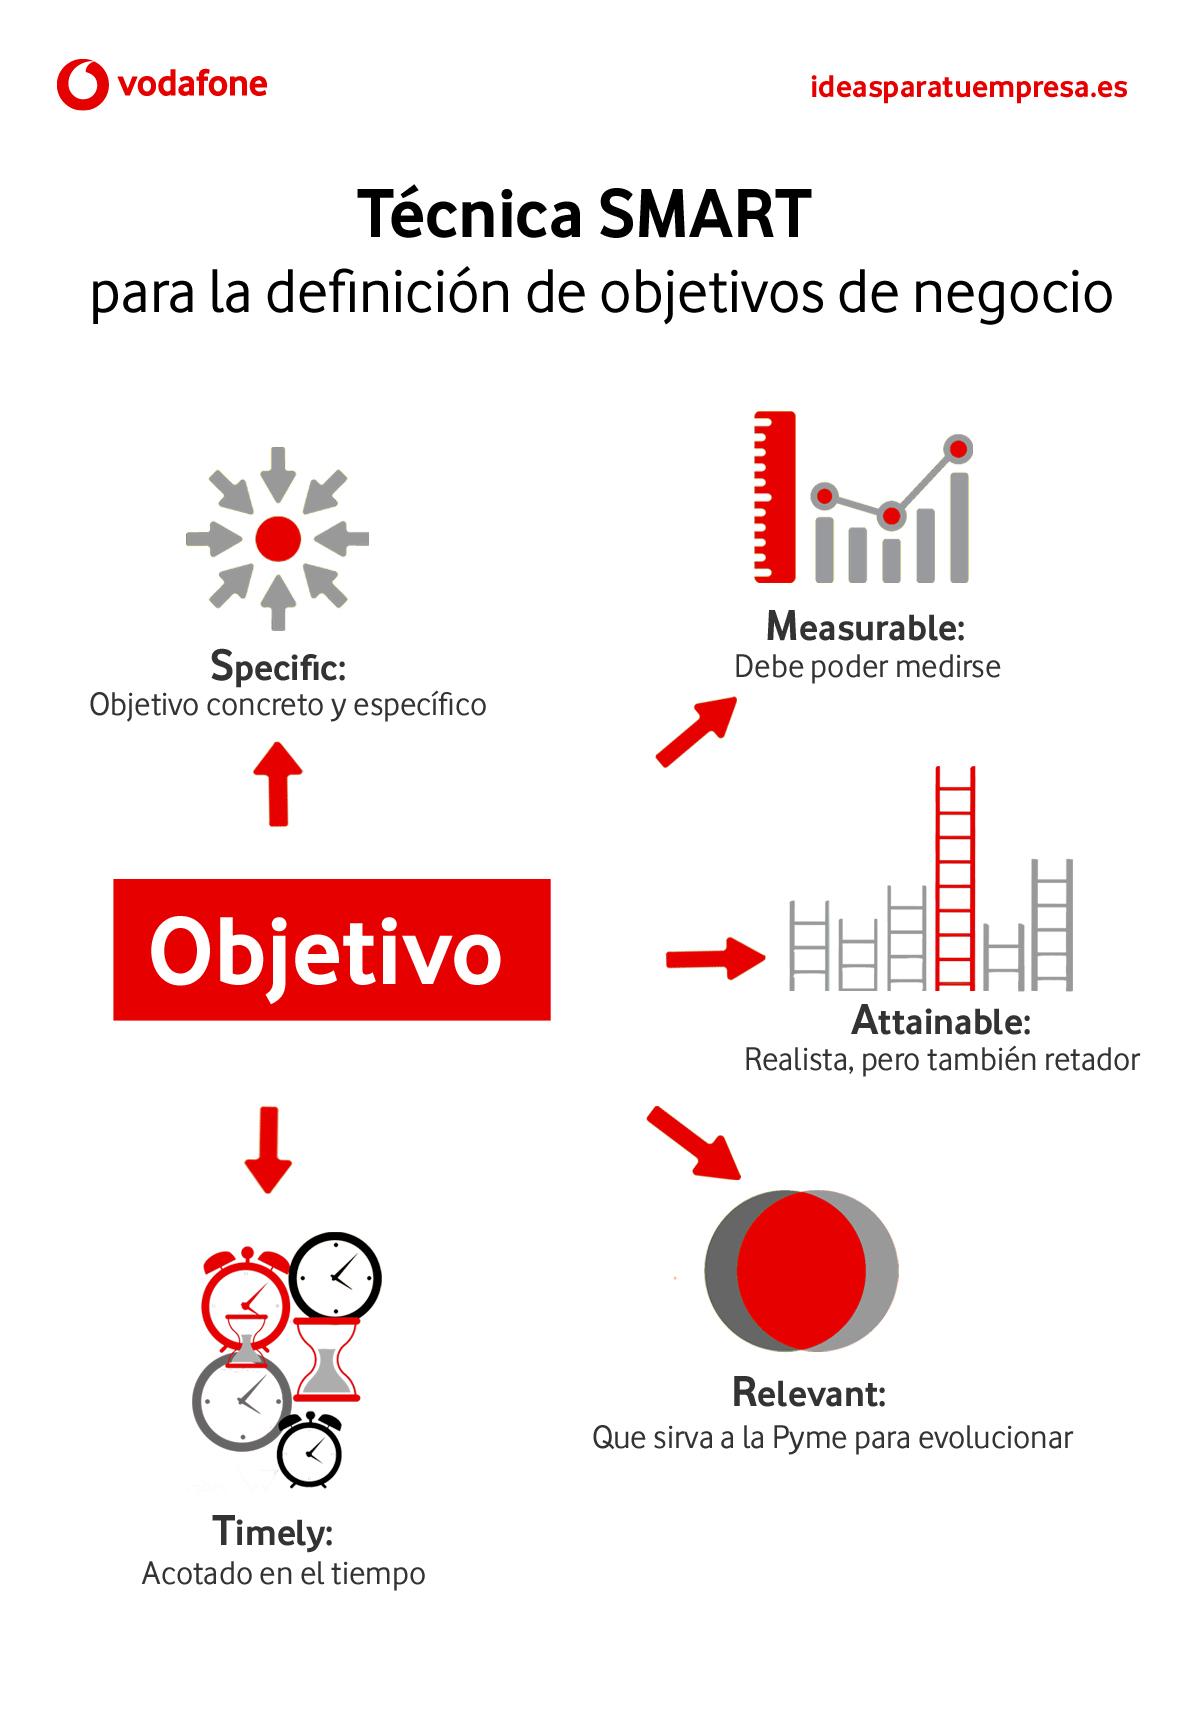 tecnica_smart_objetivos_de_negocio